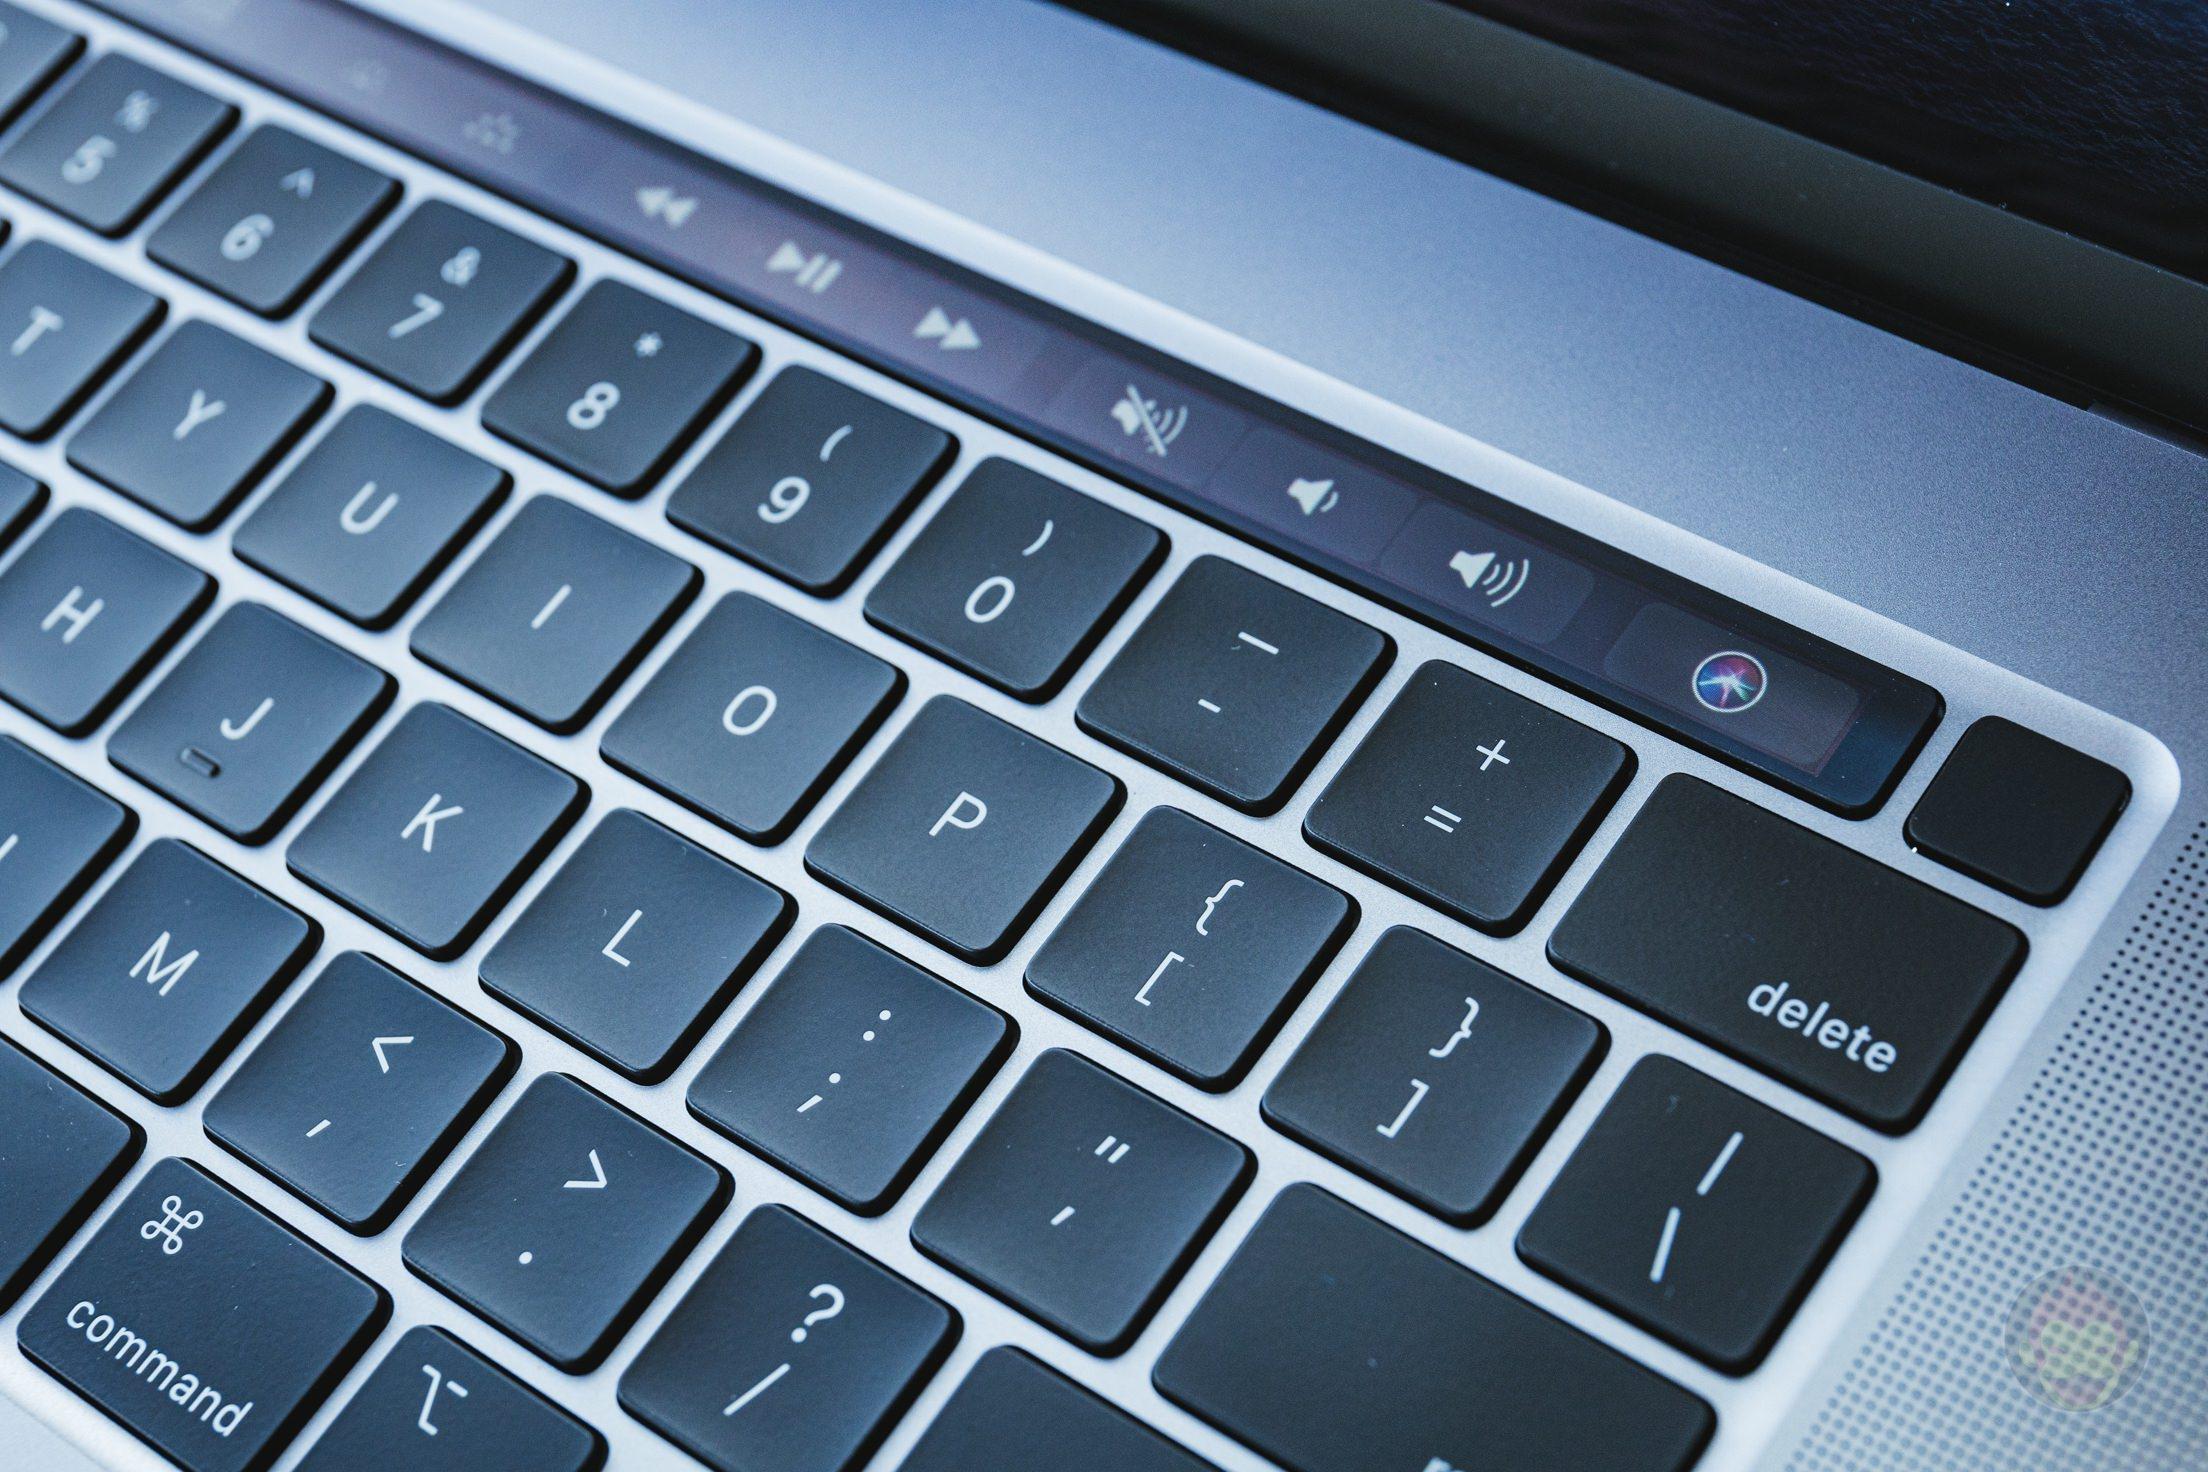 MacBook-Pro-2019-16inch-Review-BlueBackground-09.jpg